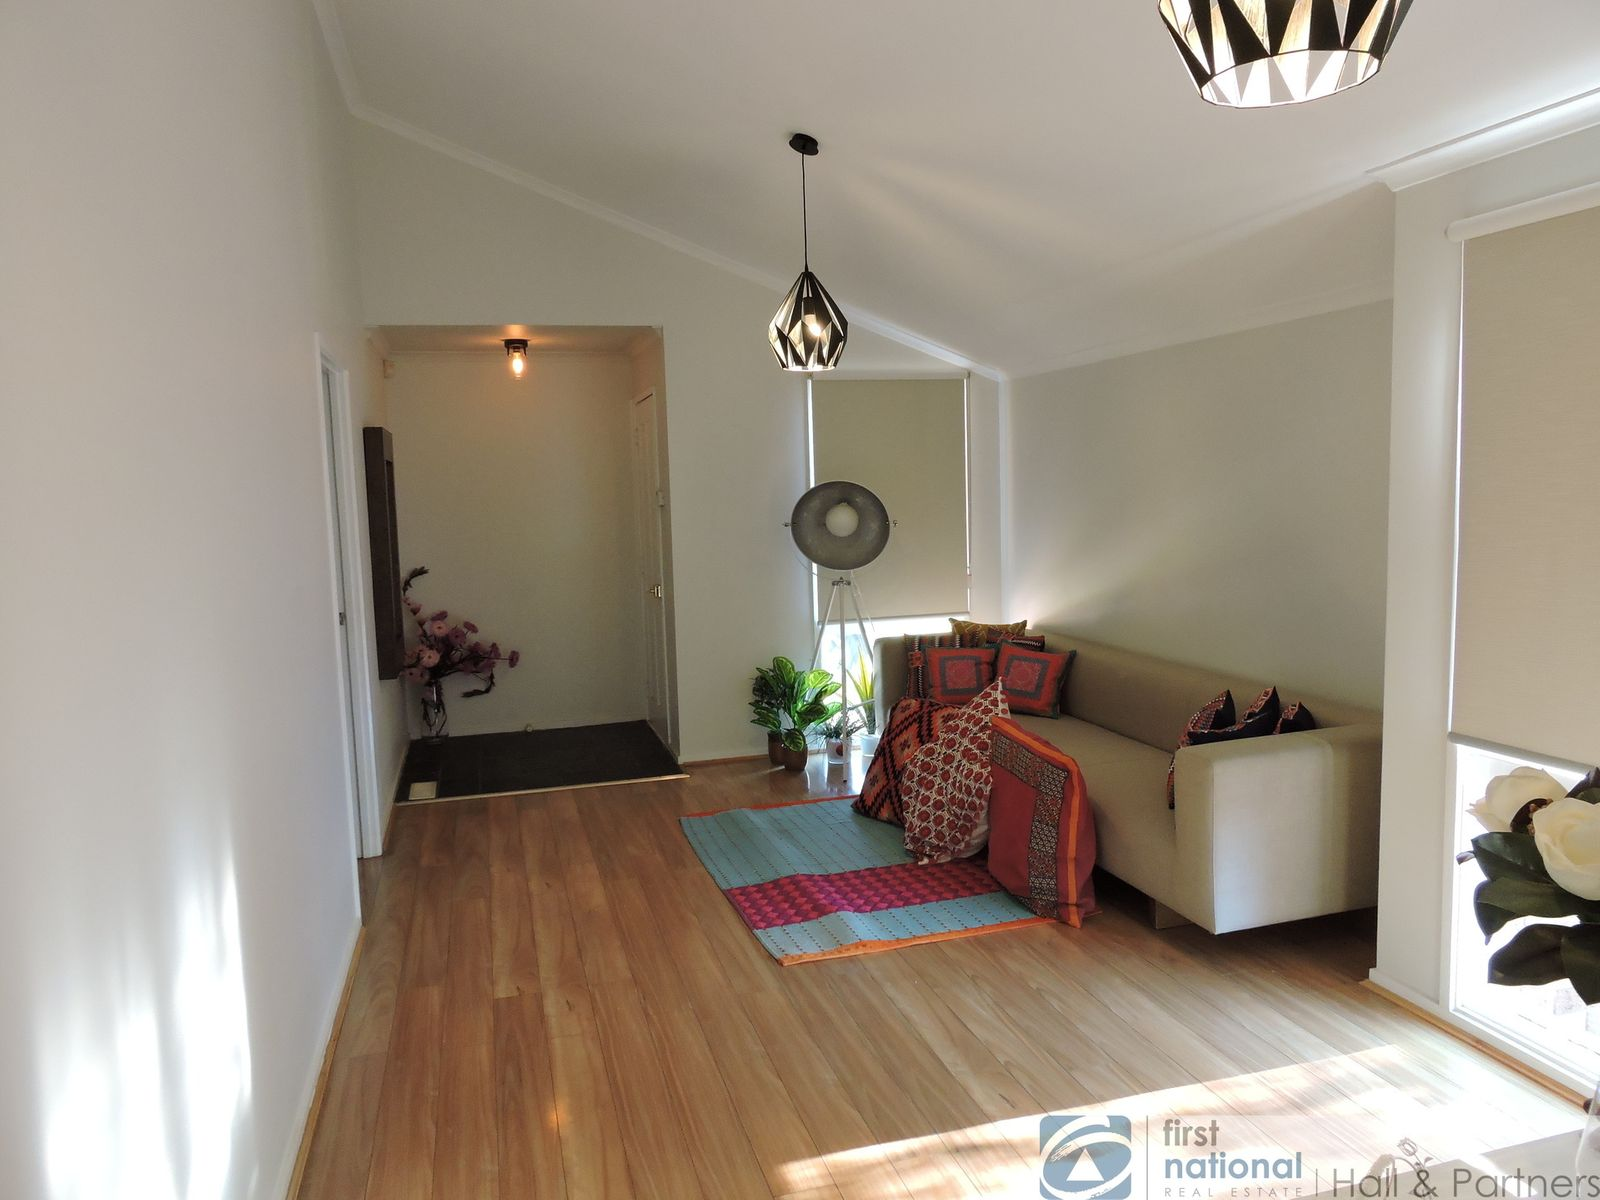 99 Shetland Street, Endeavour Hills, VIC 3802